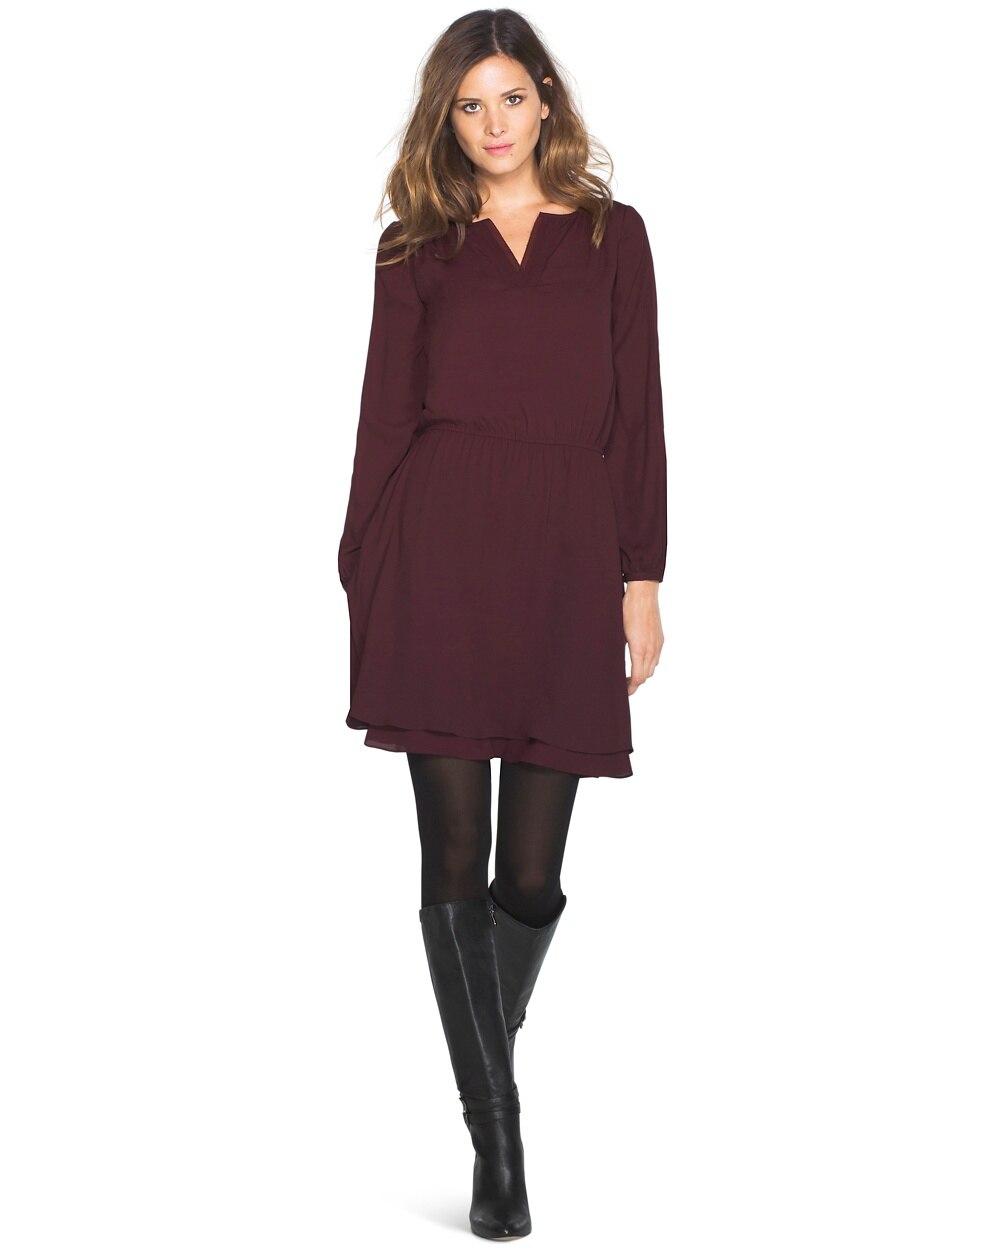 Layered Skirt Dress